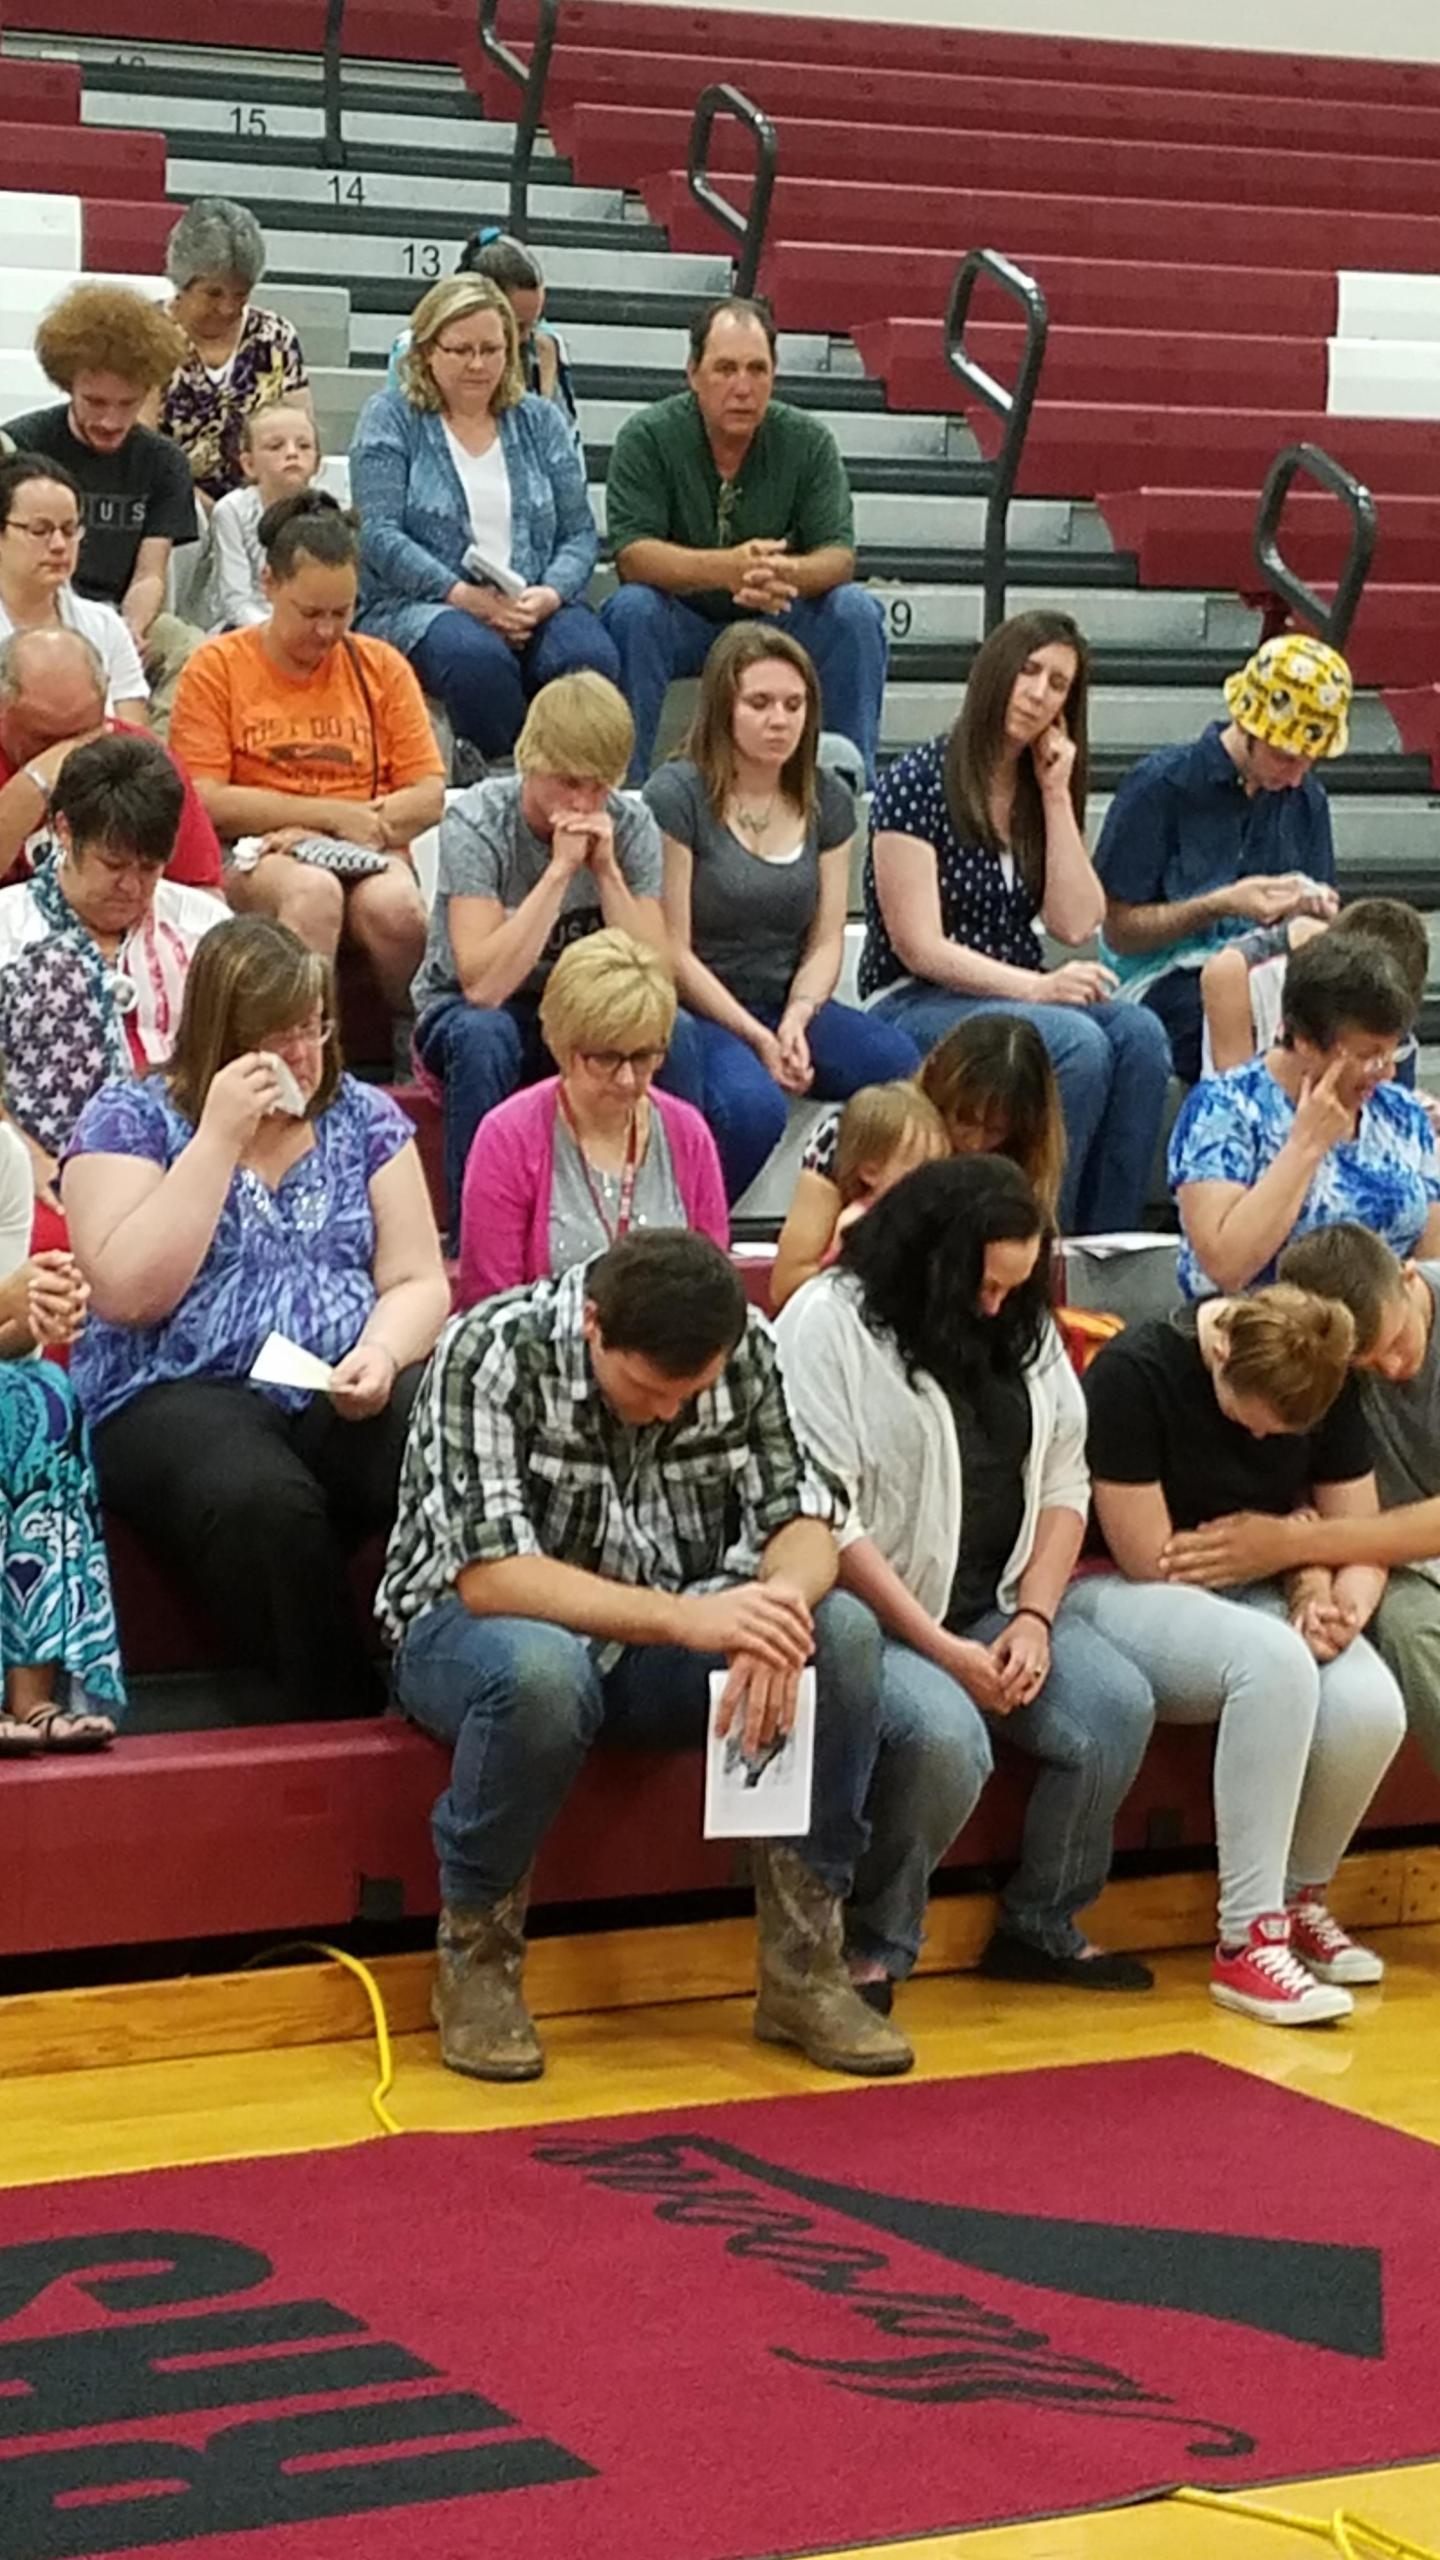 robinson prayer vigil 3_1495596123279.jpeg